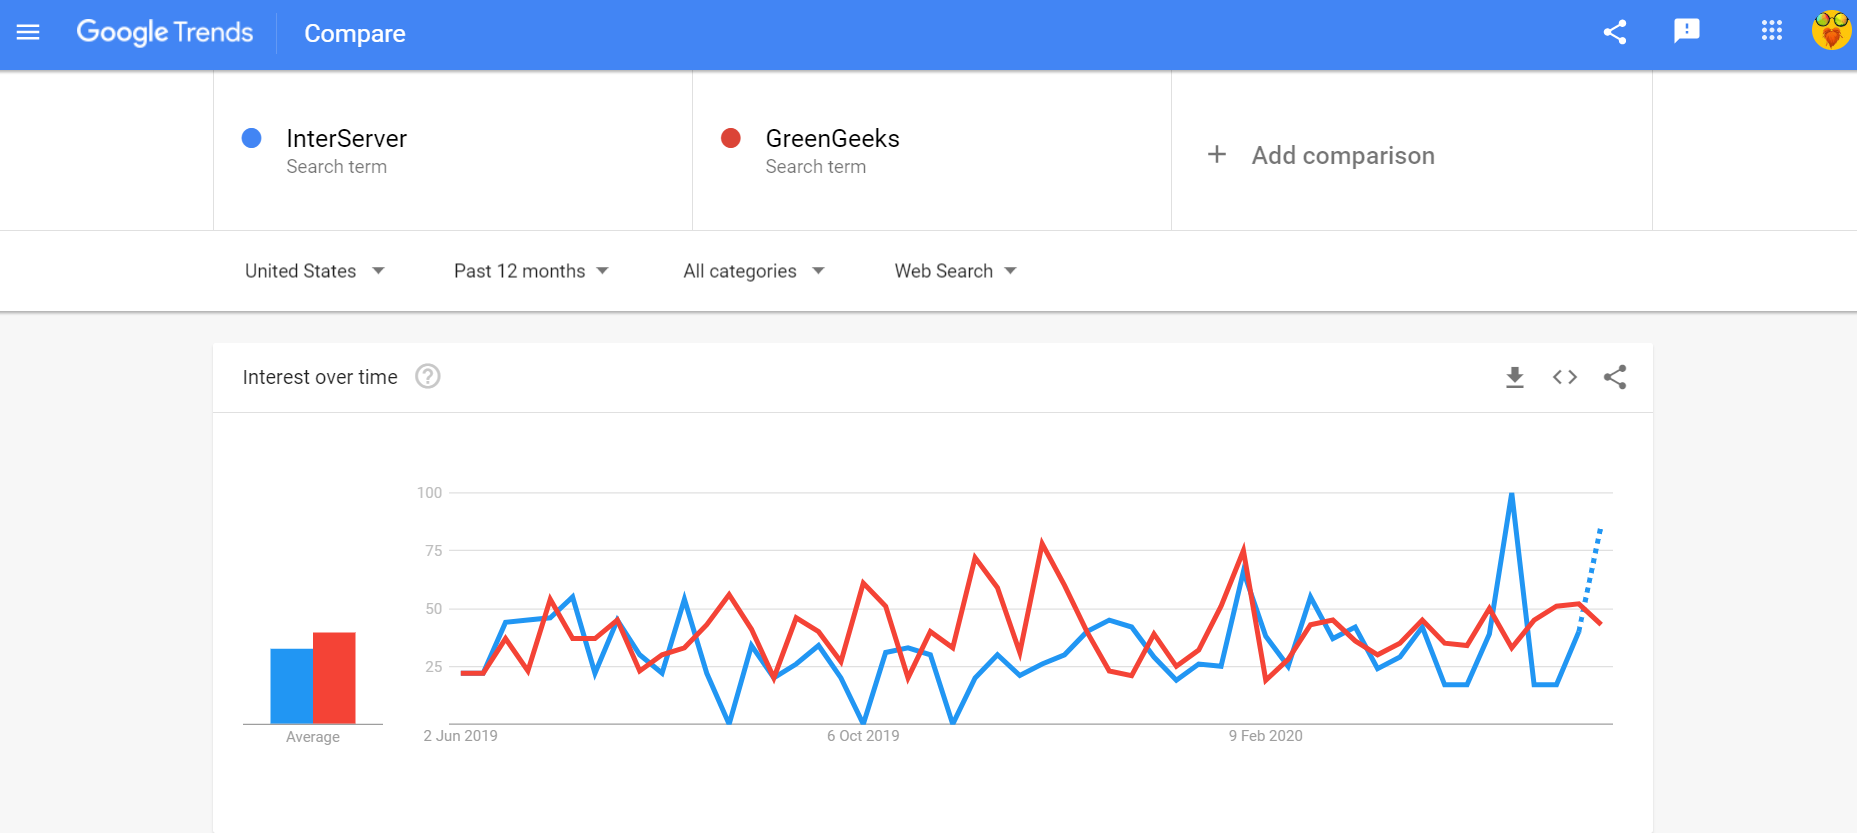 google trends InterServer vs GreenGeeks